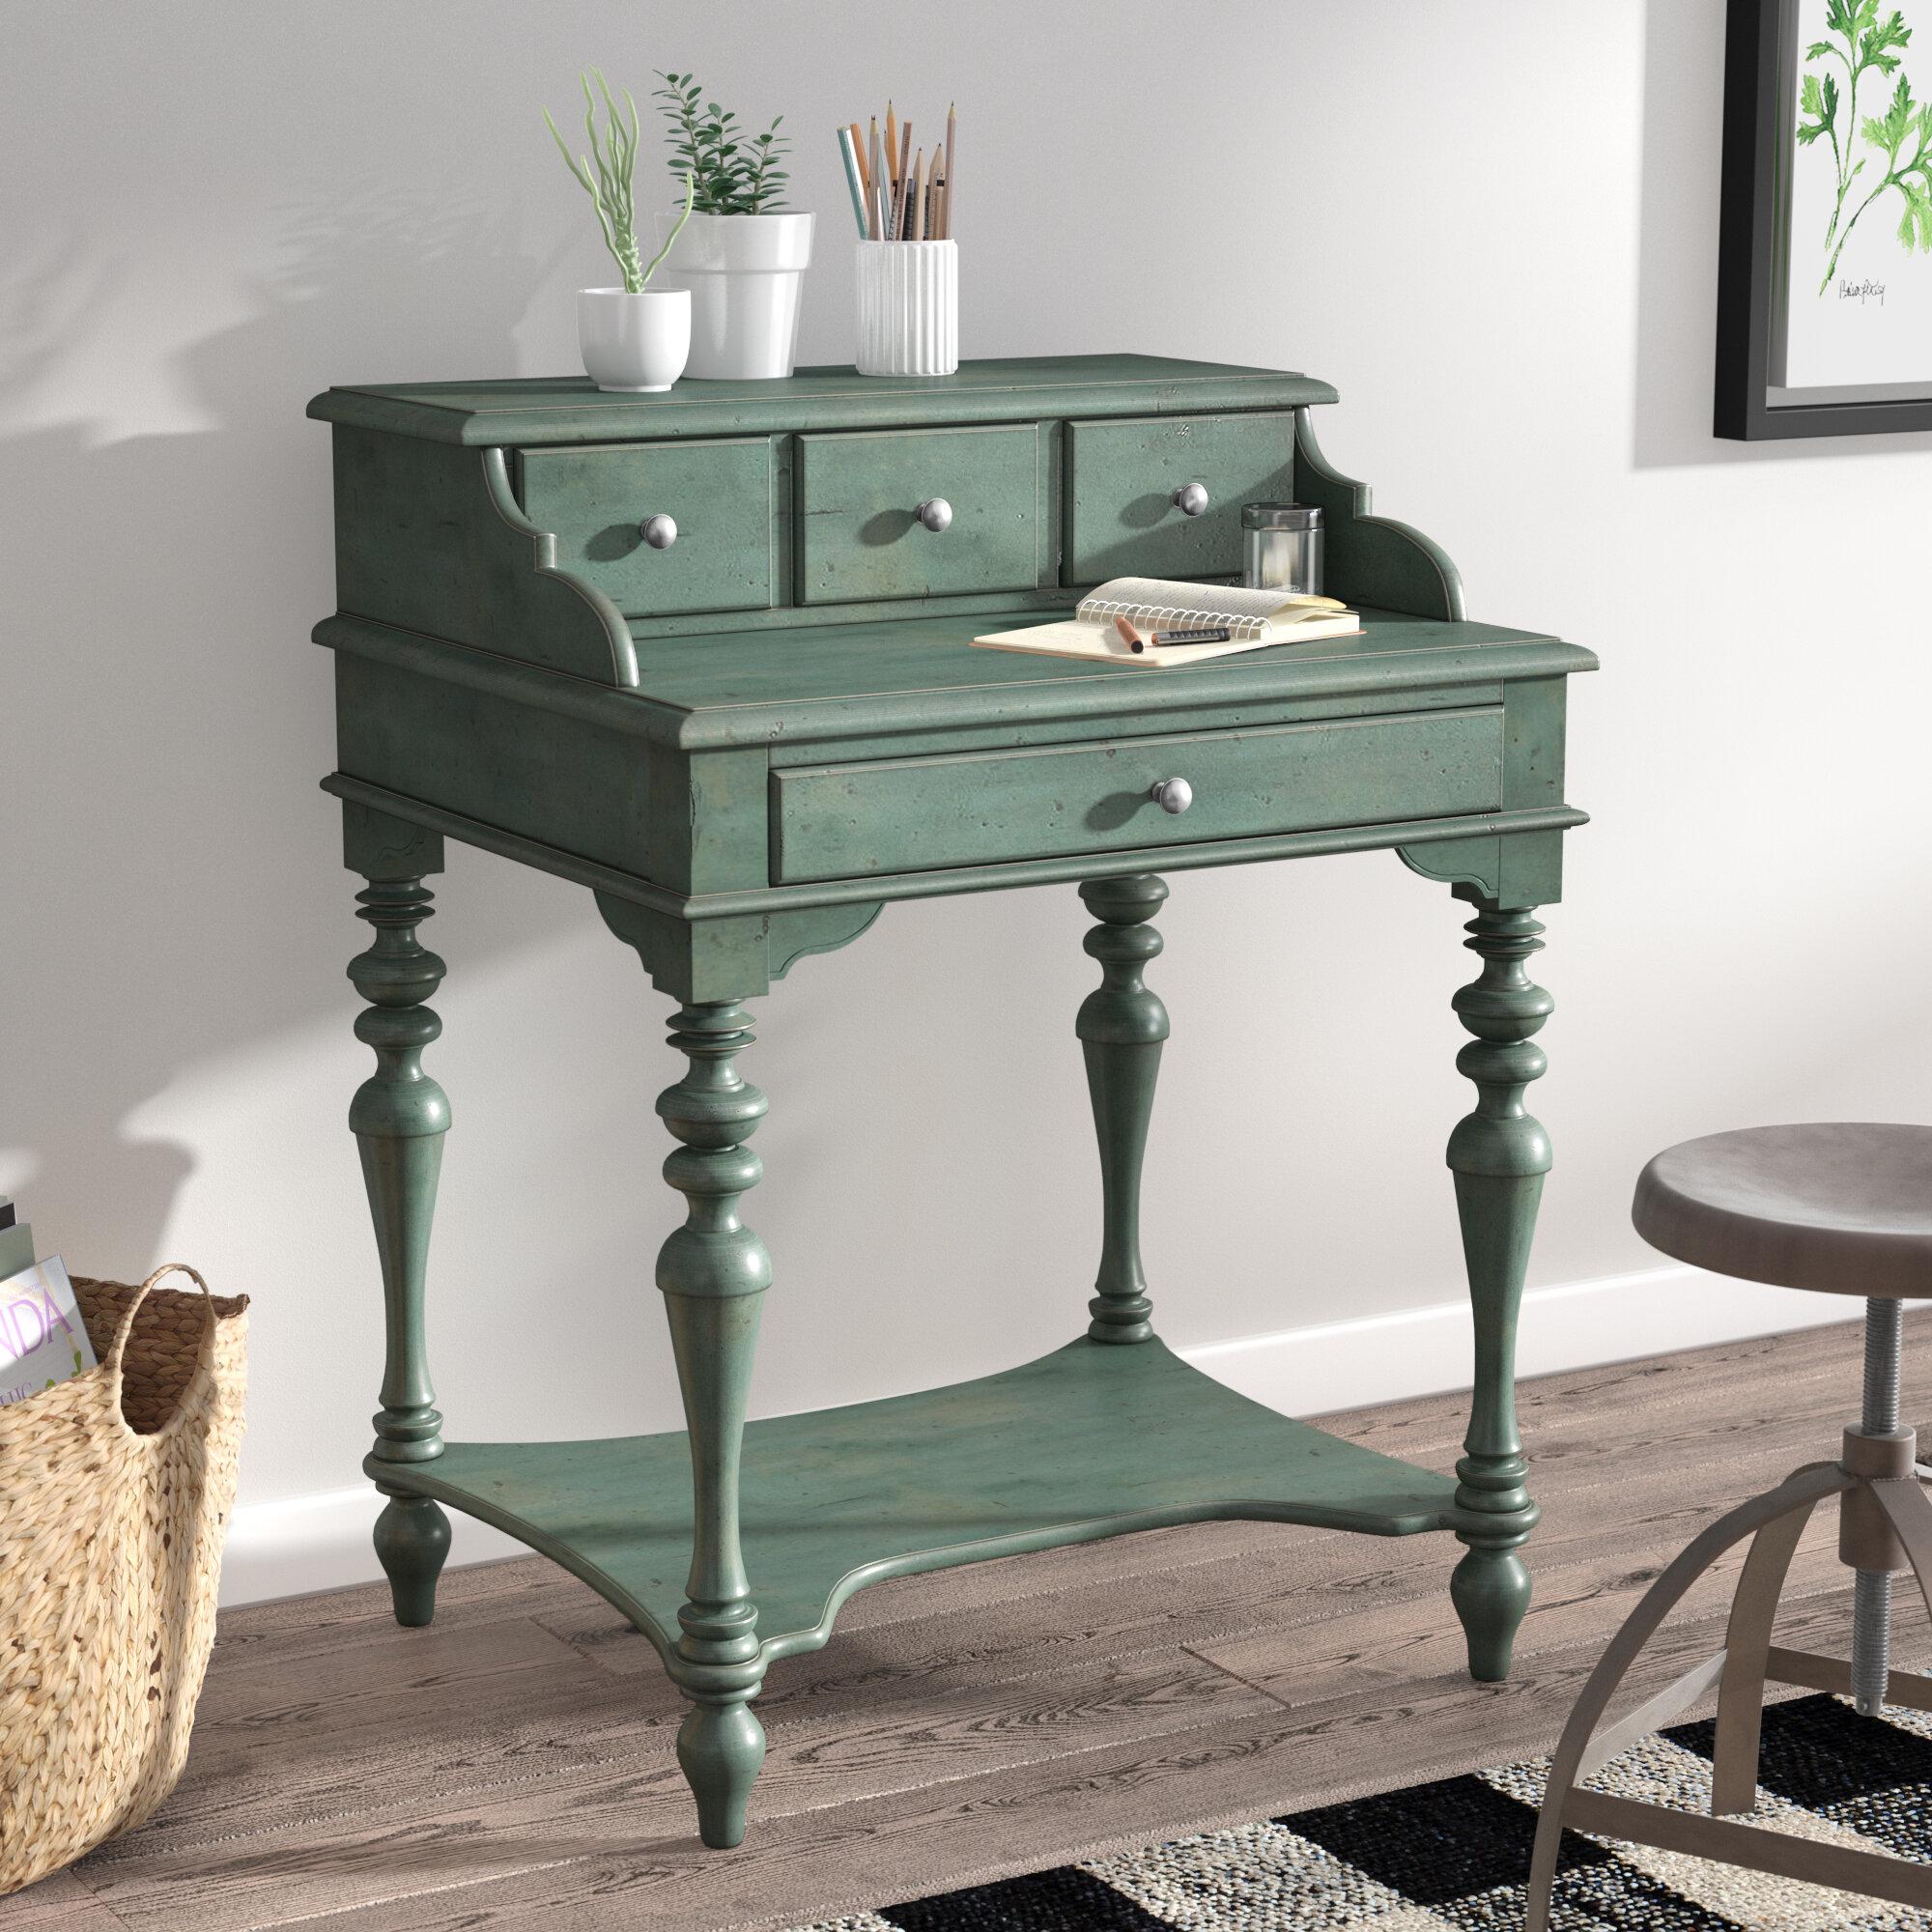 stores hart white spo desk secretary magasins products